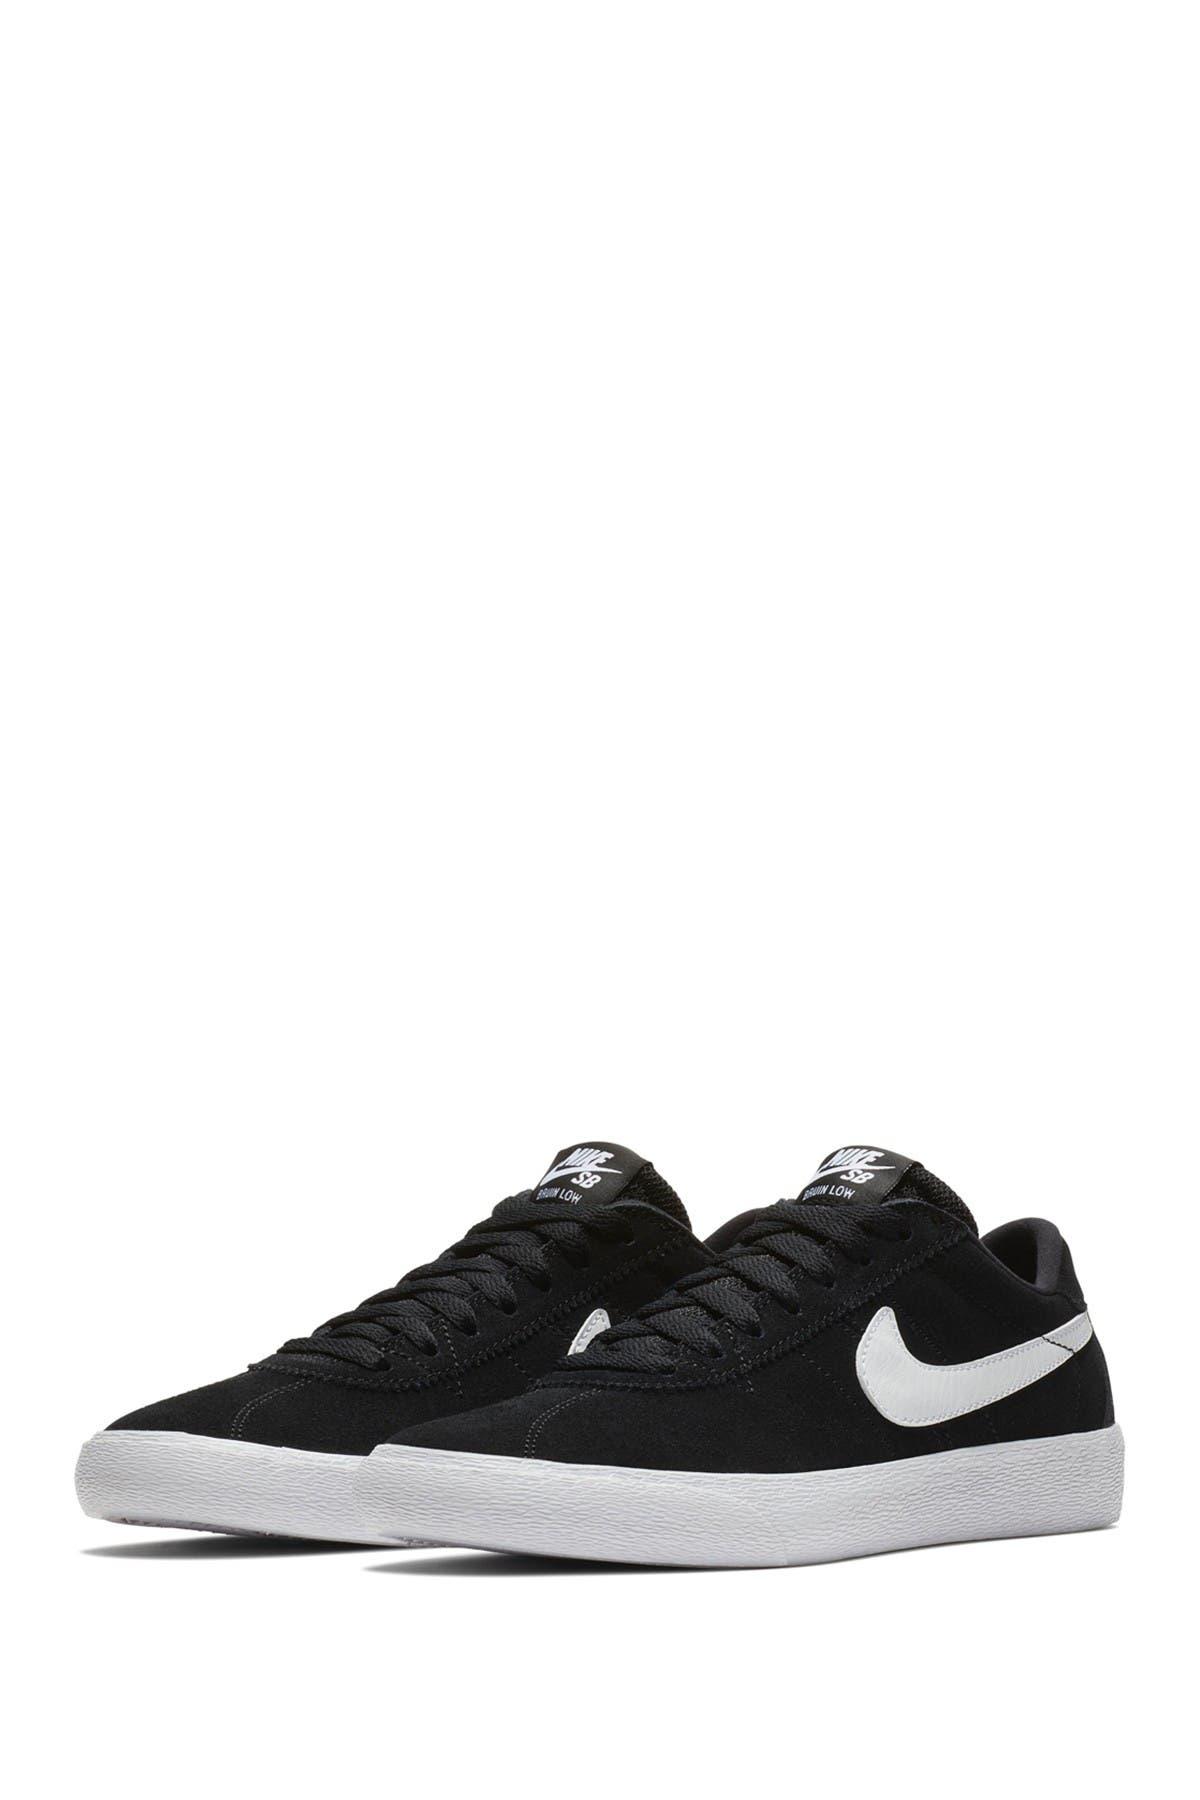 Nike | SB Bruin Low Skateboarding